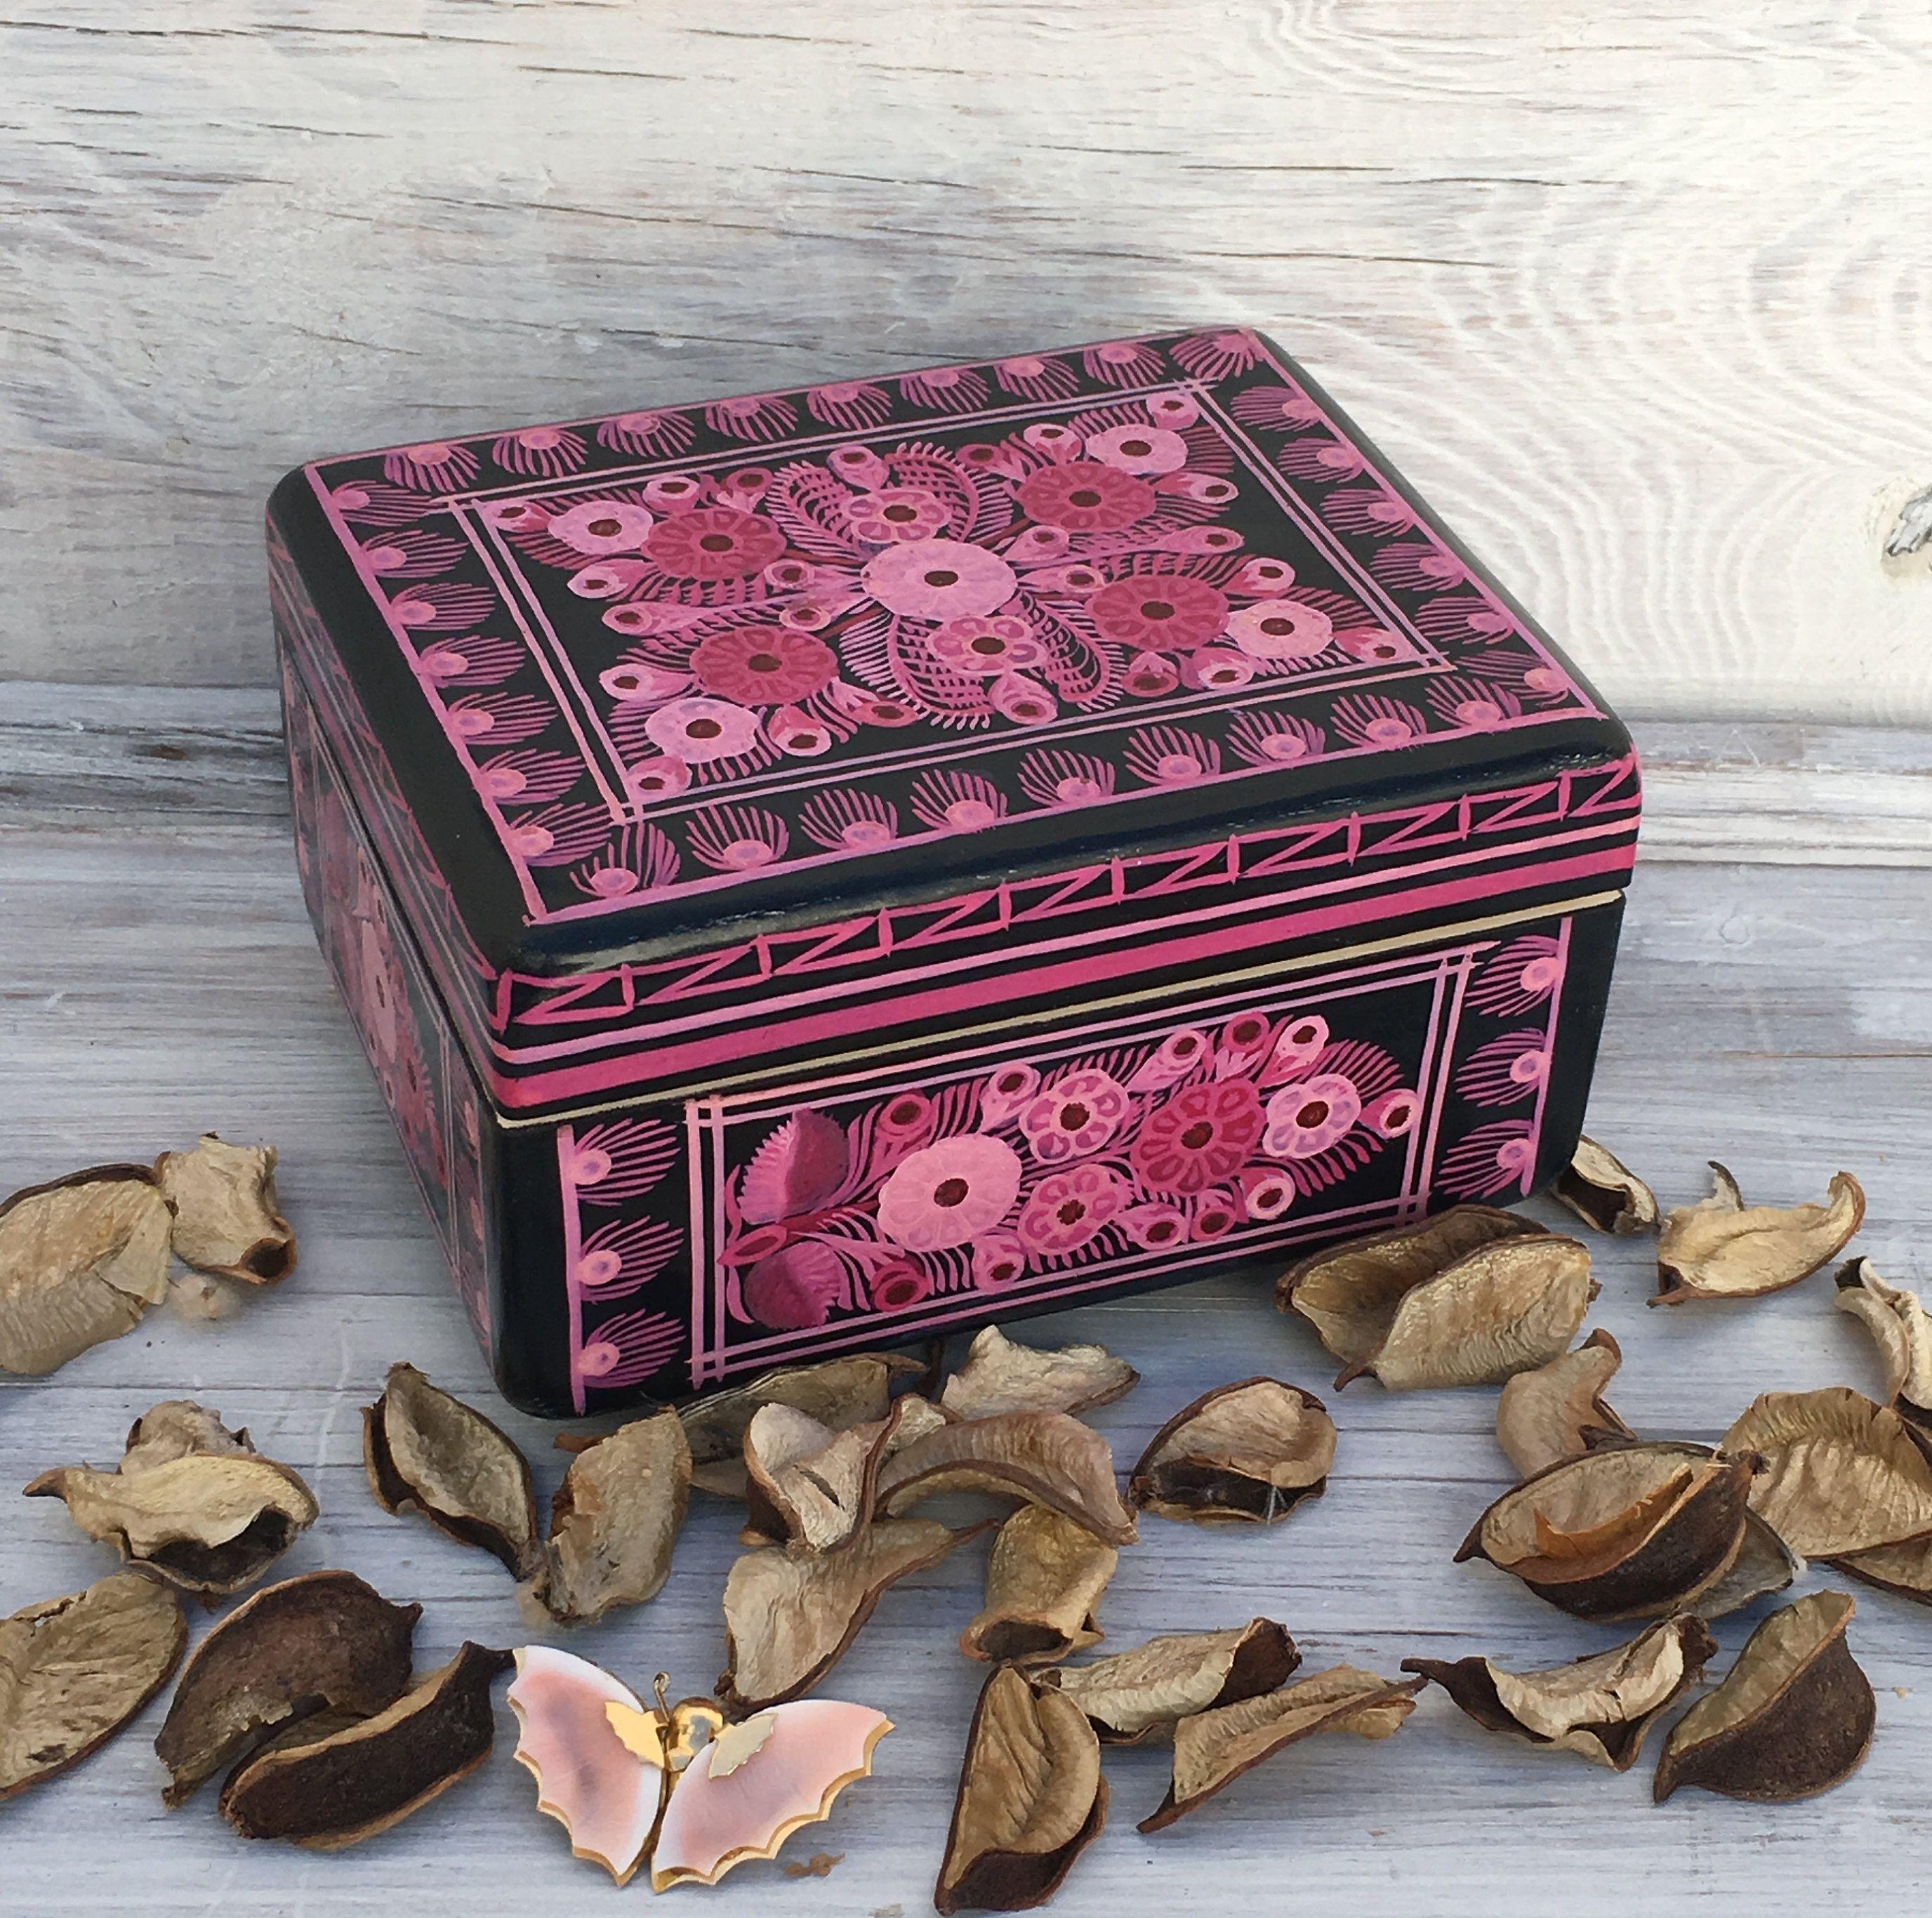 Jewelry Box Hand Painted Olinala Box Wooden Box Keepsake Box Jewellery Box Jewelry Storage Wood Box Jewelry Org Wooden Jewelry Boxes Mexican Folk Art Box Hand